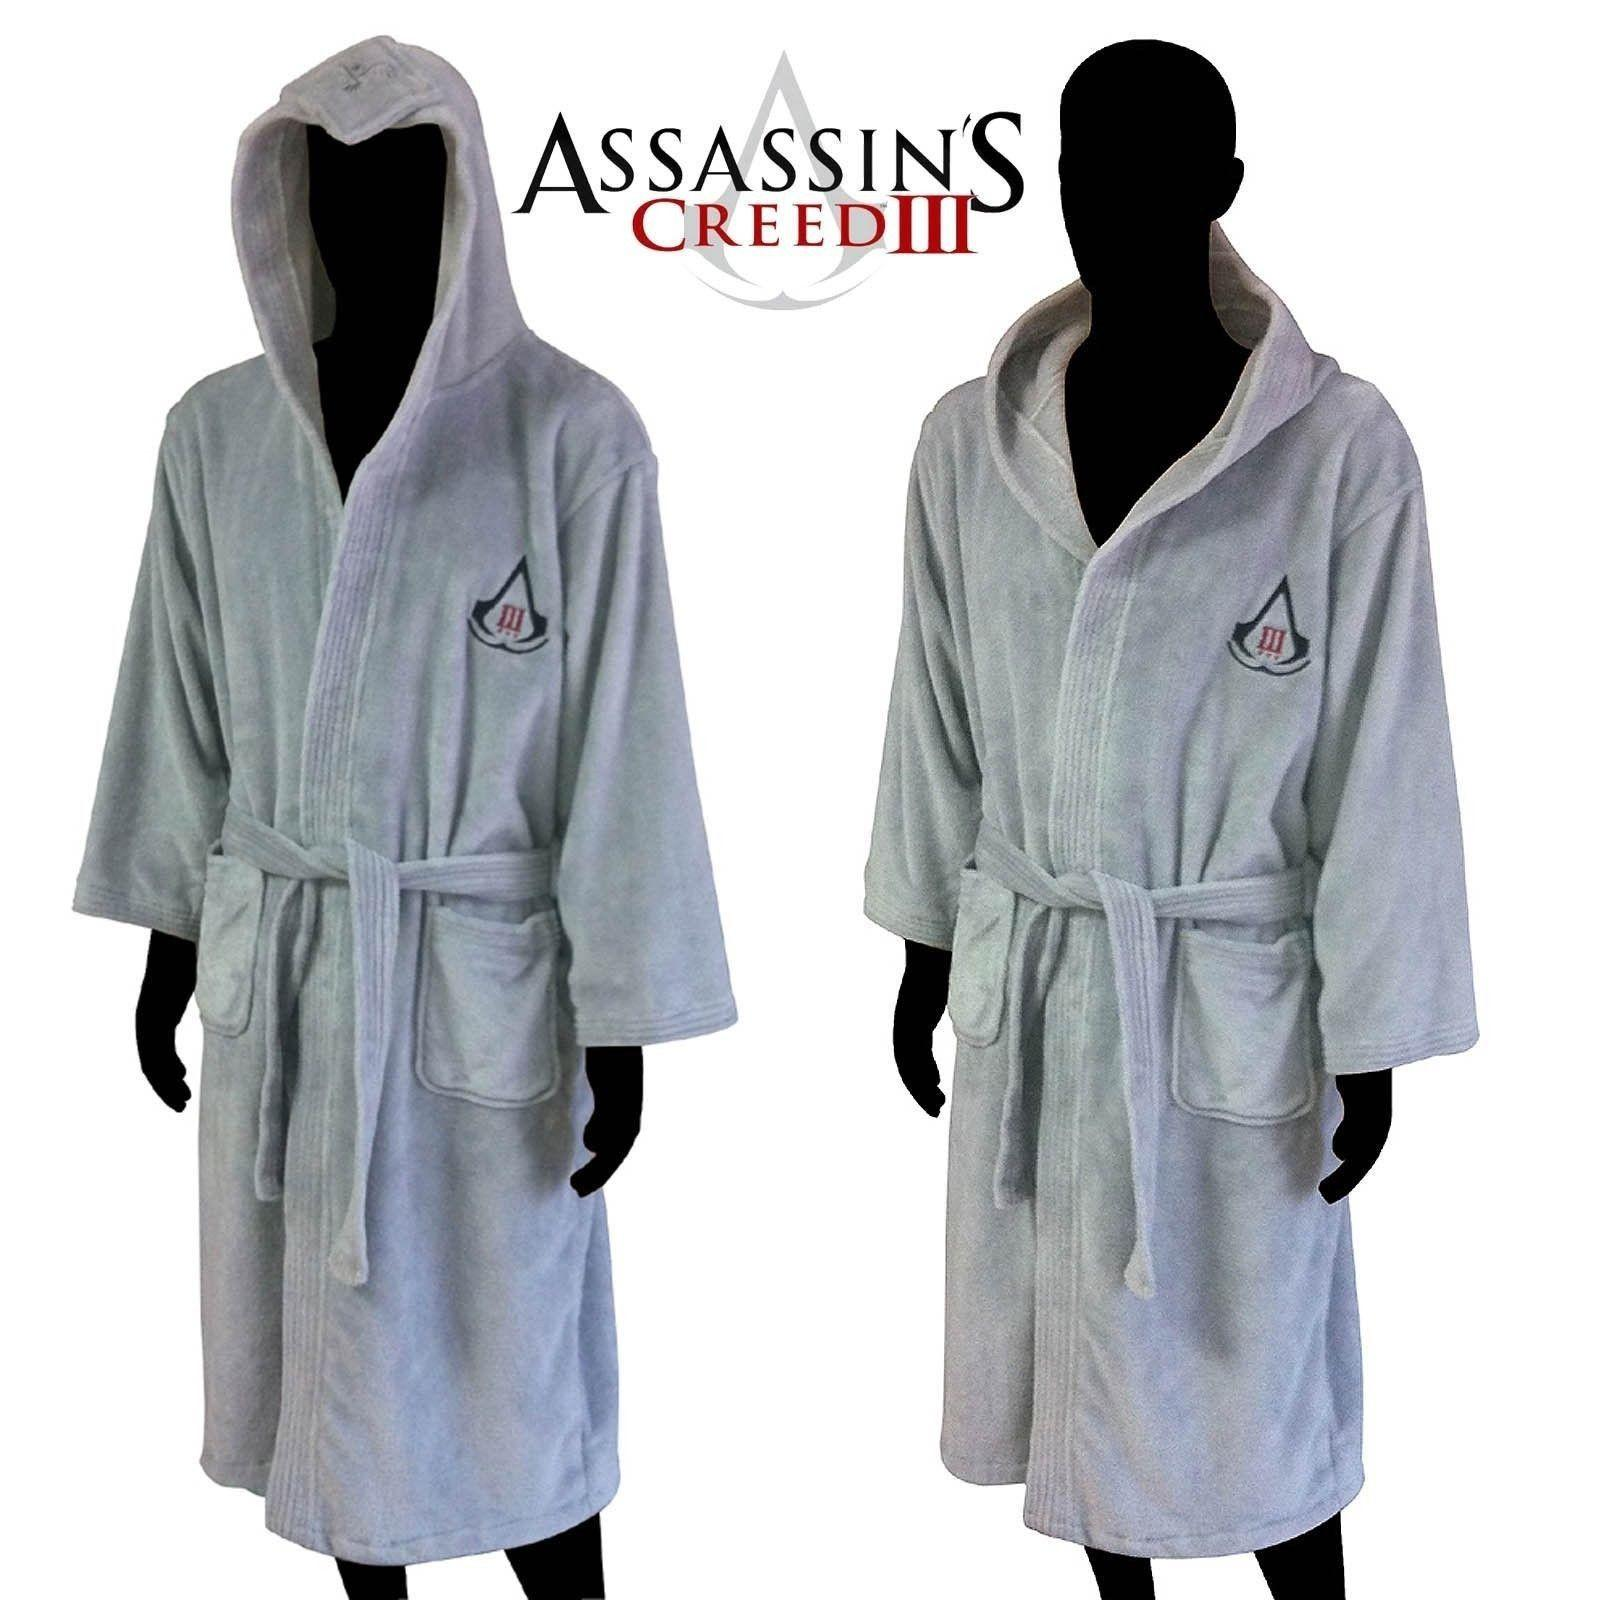 Assassins Creed Bath Robe Bathrobe Cosplay Costume Flannel Light